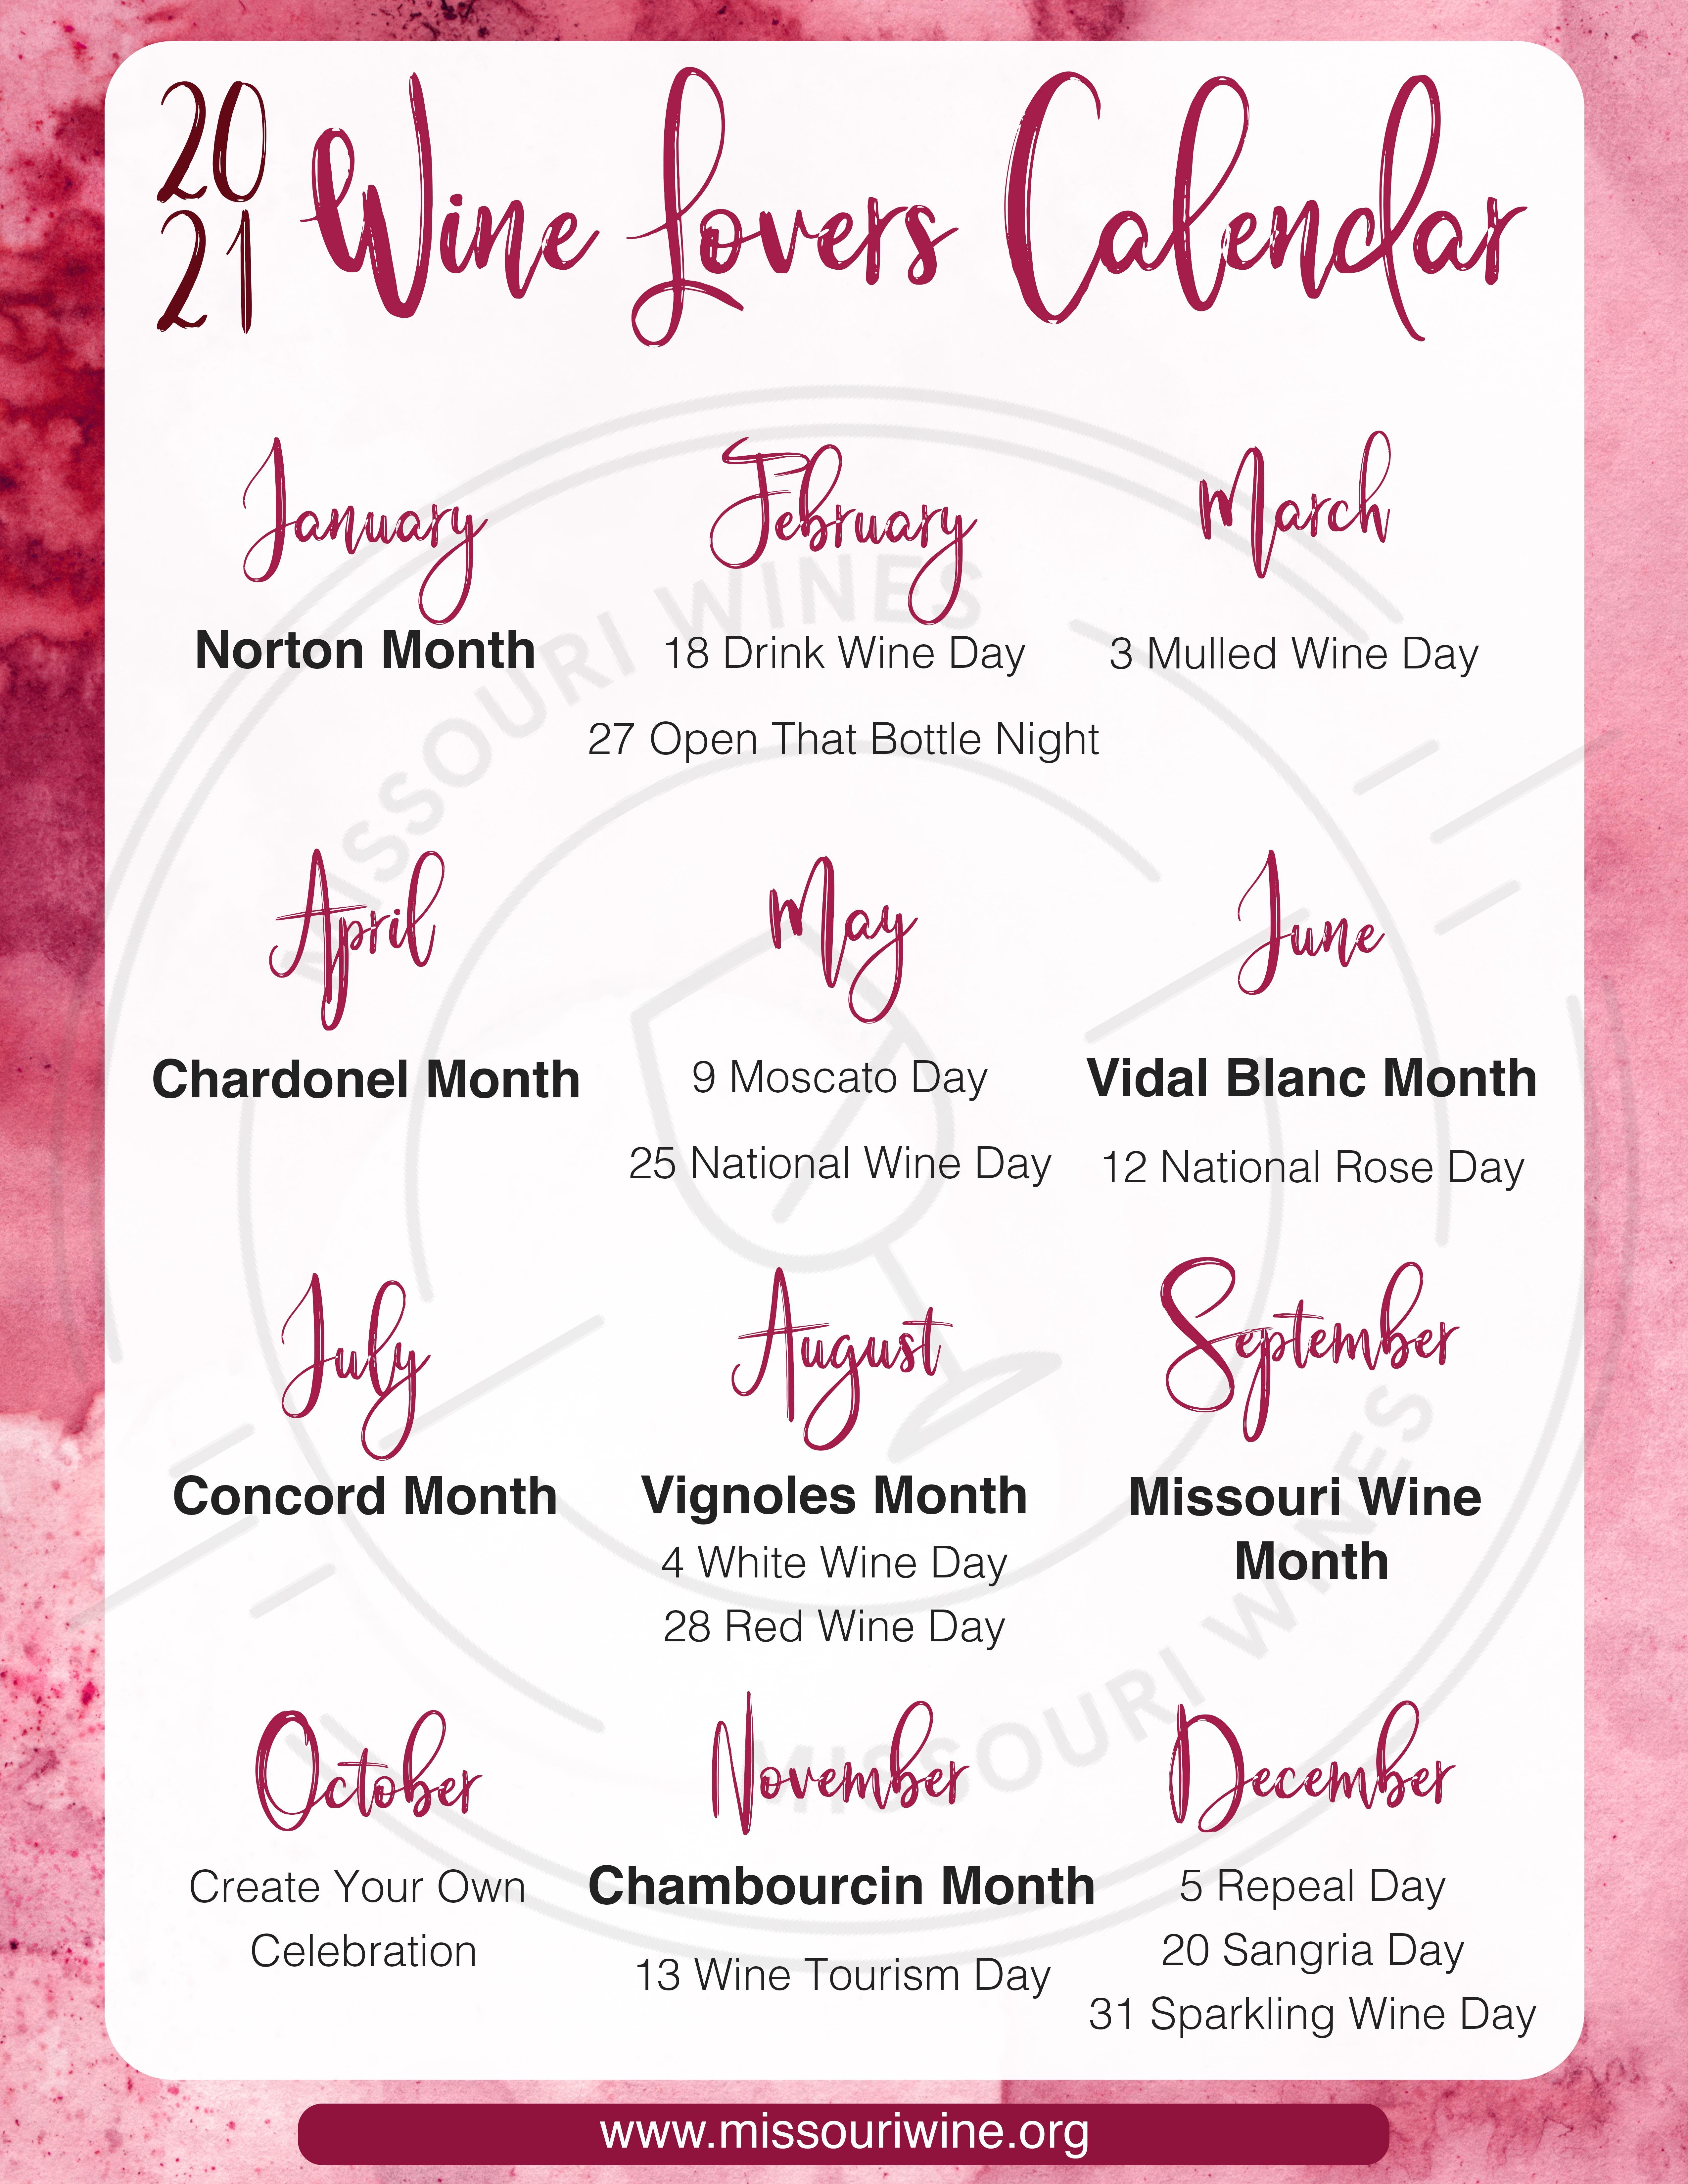 MO Wine Lover's Calendar